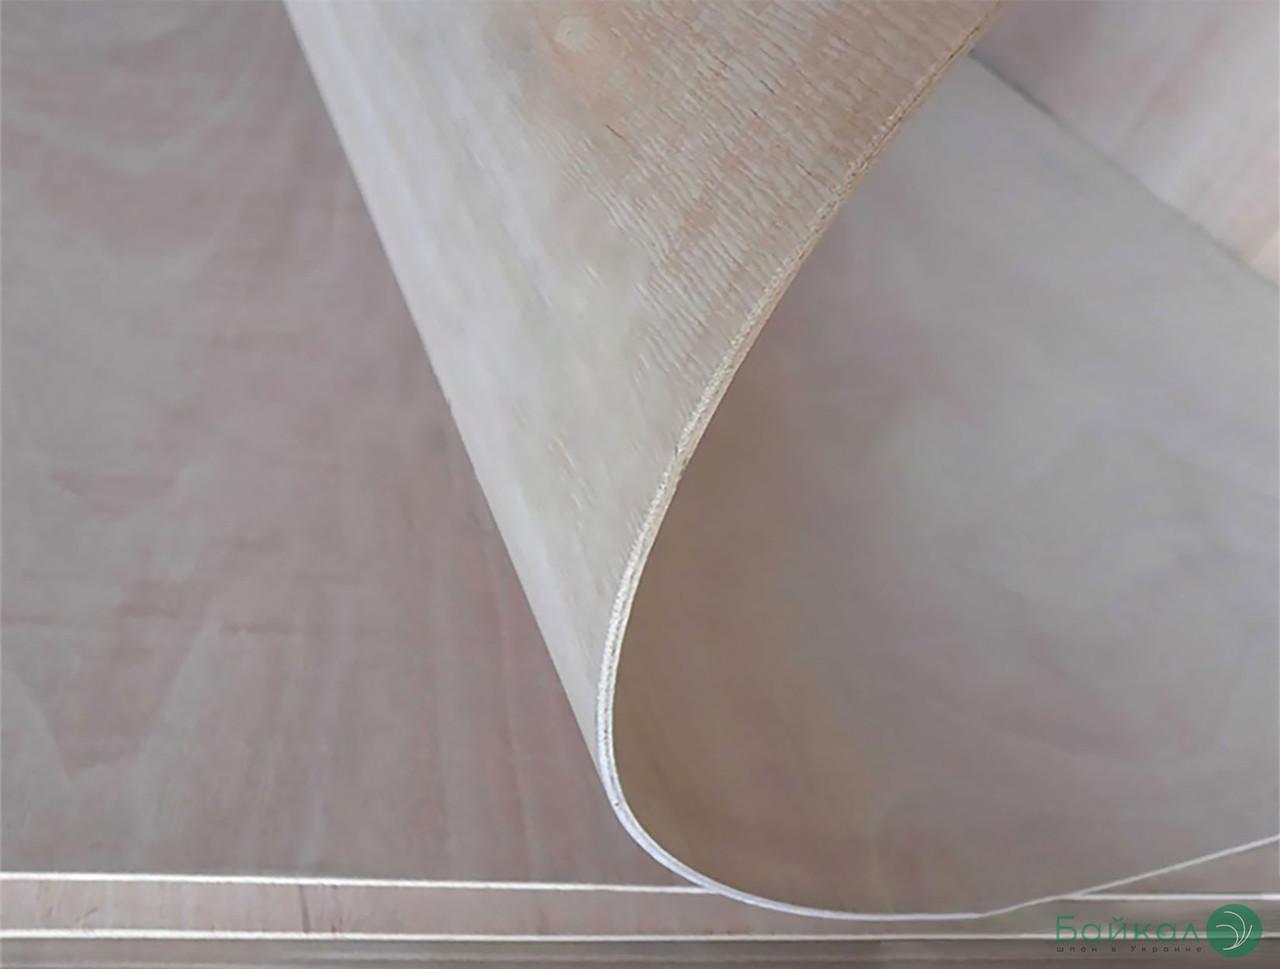 Фанера Сейба гнучка 3 мм - 2,44 х1,22 м (Поздовжня / Long)